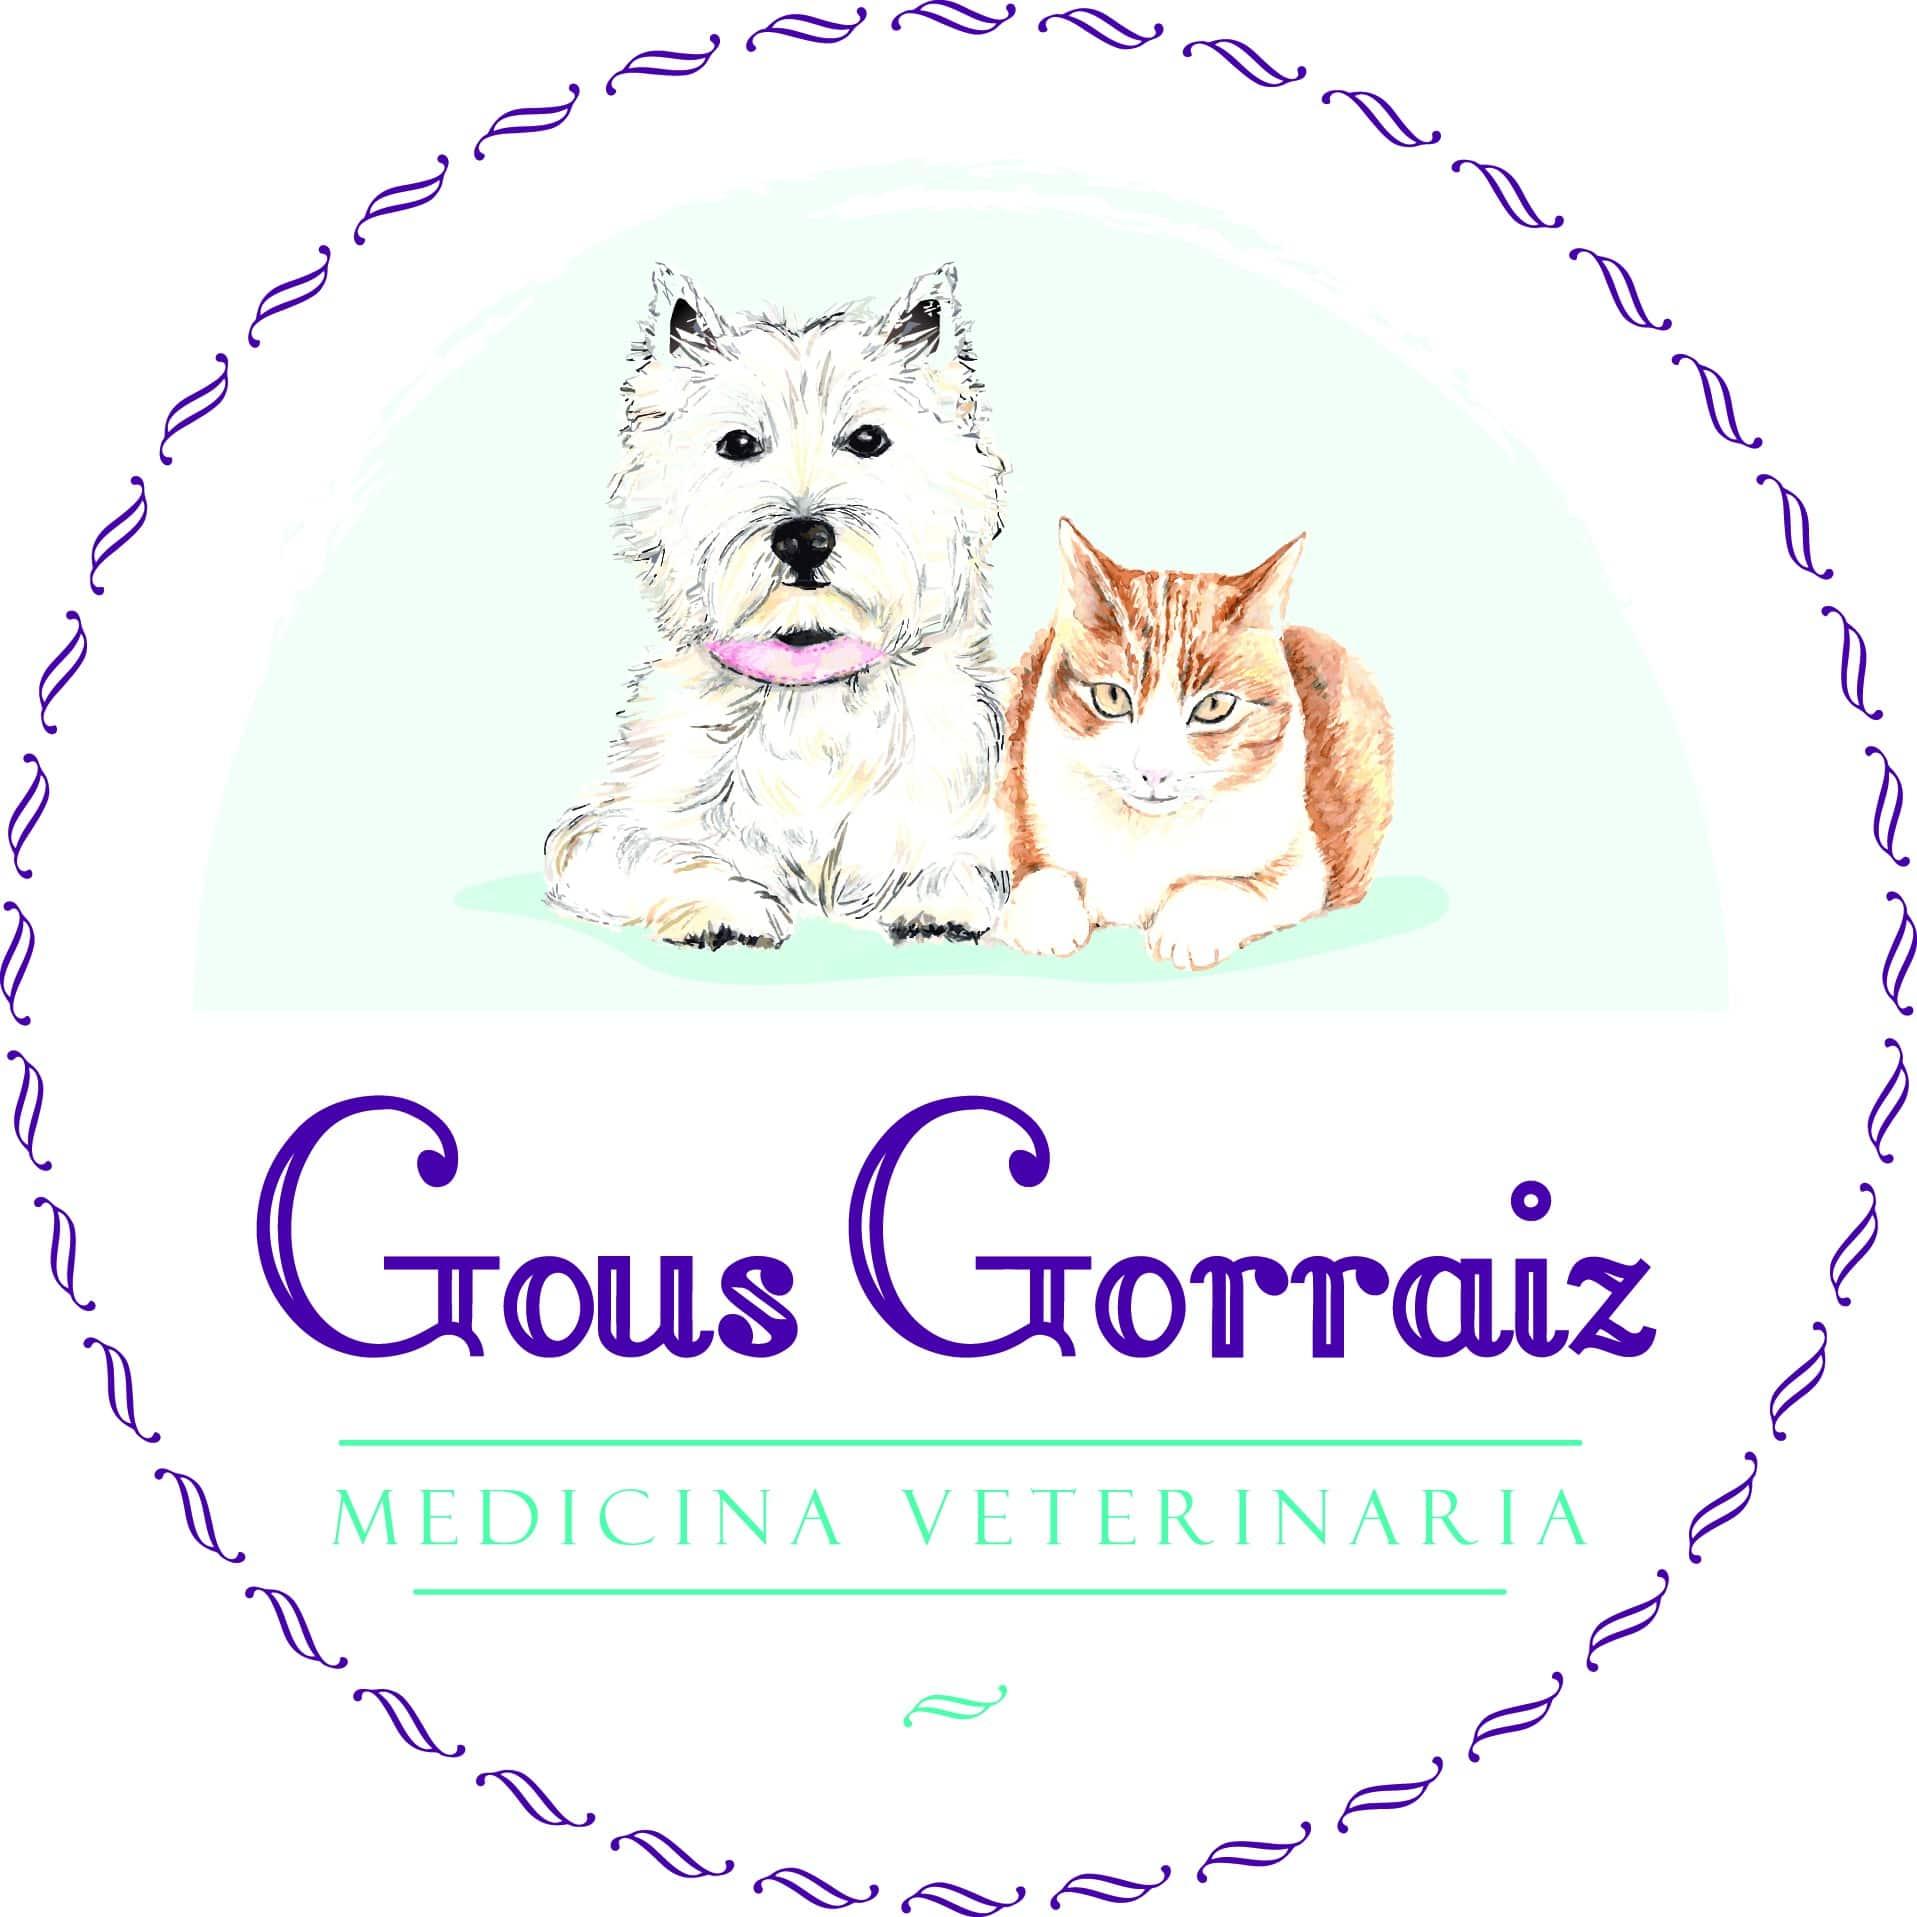 logo clinica veterinaria gous